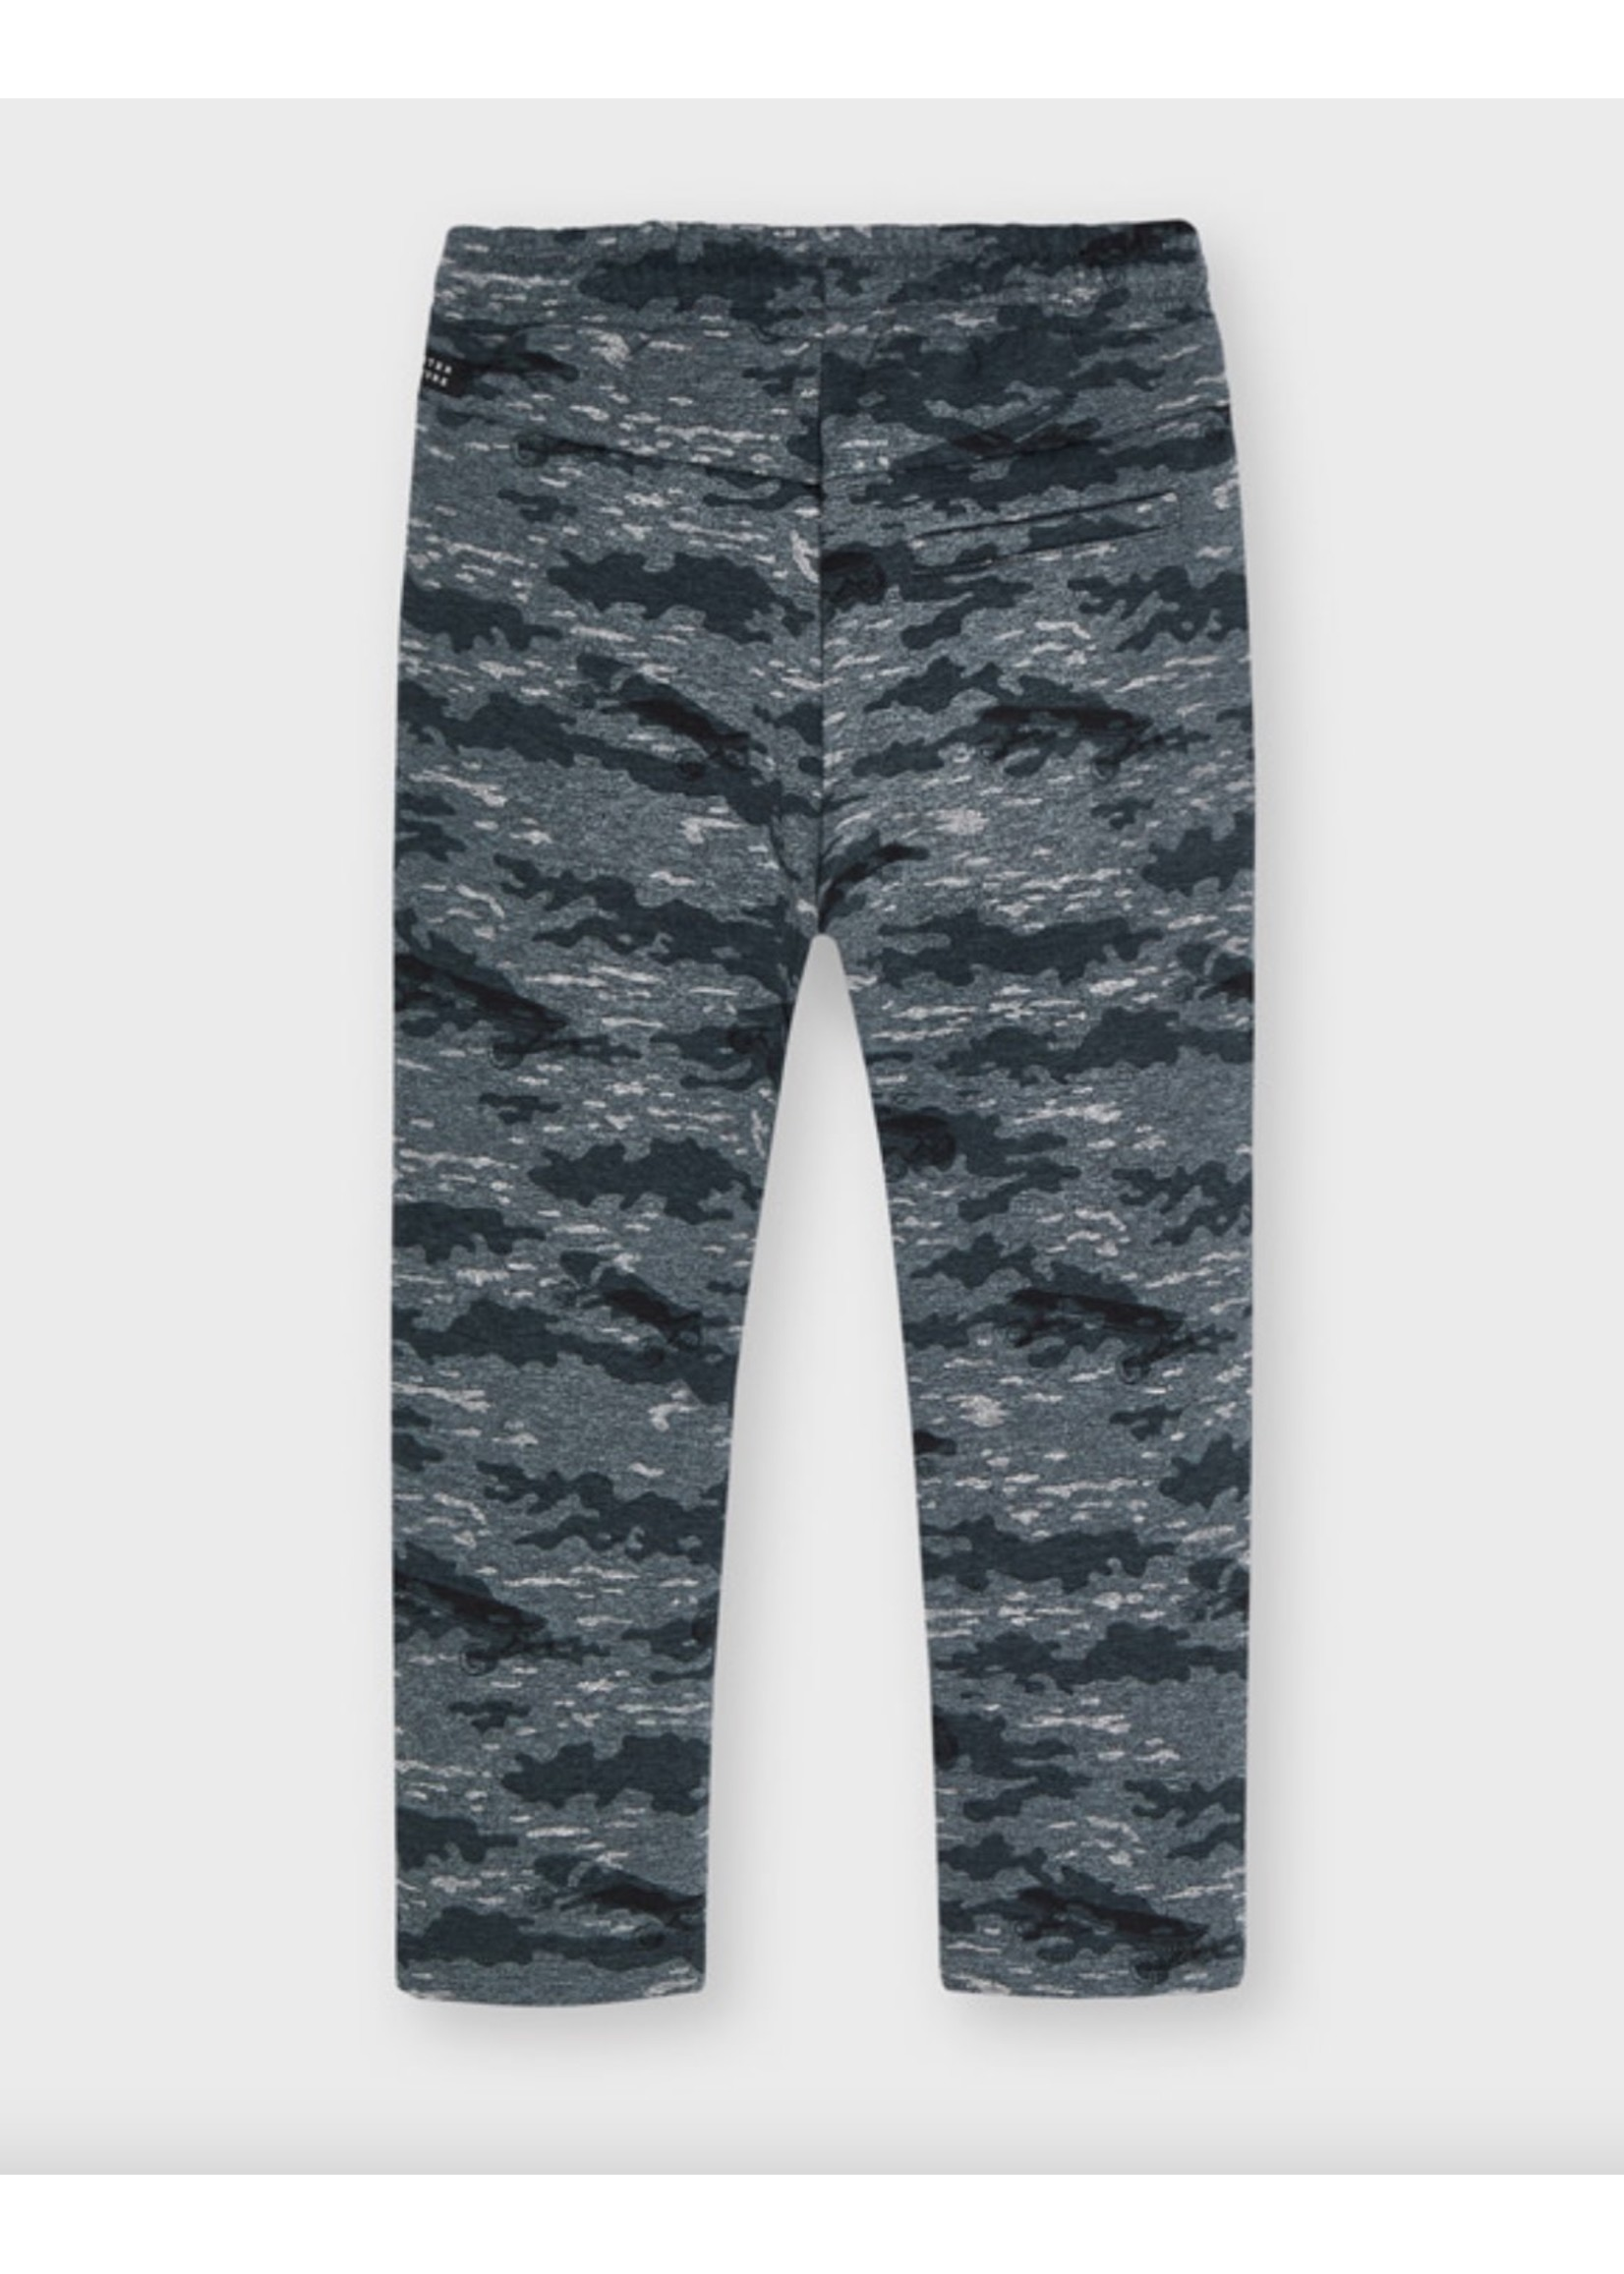 Mayoral Mayoral,  Printed Pants in Mixed Asphalt